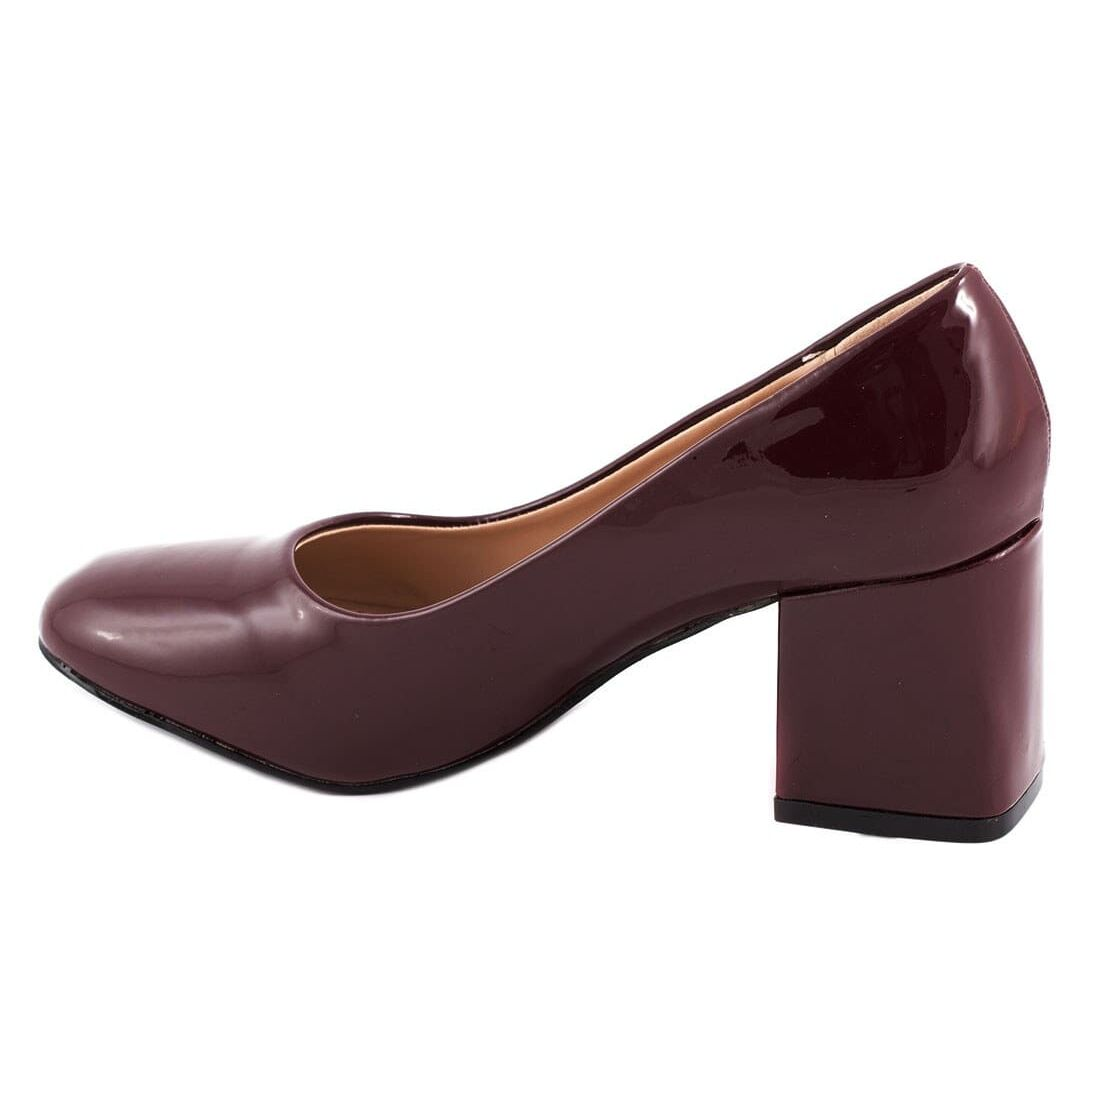 Pantofi de dama cu toc 51598ALB-PT la 39,99Lei - Zibra.ro